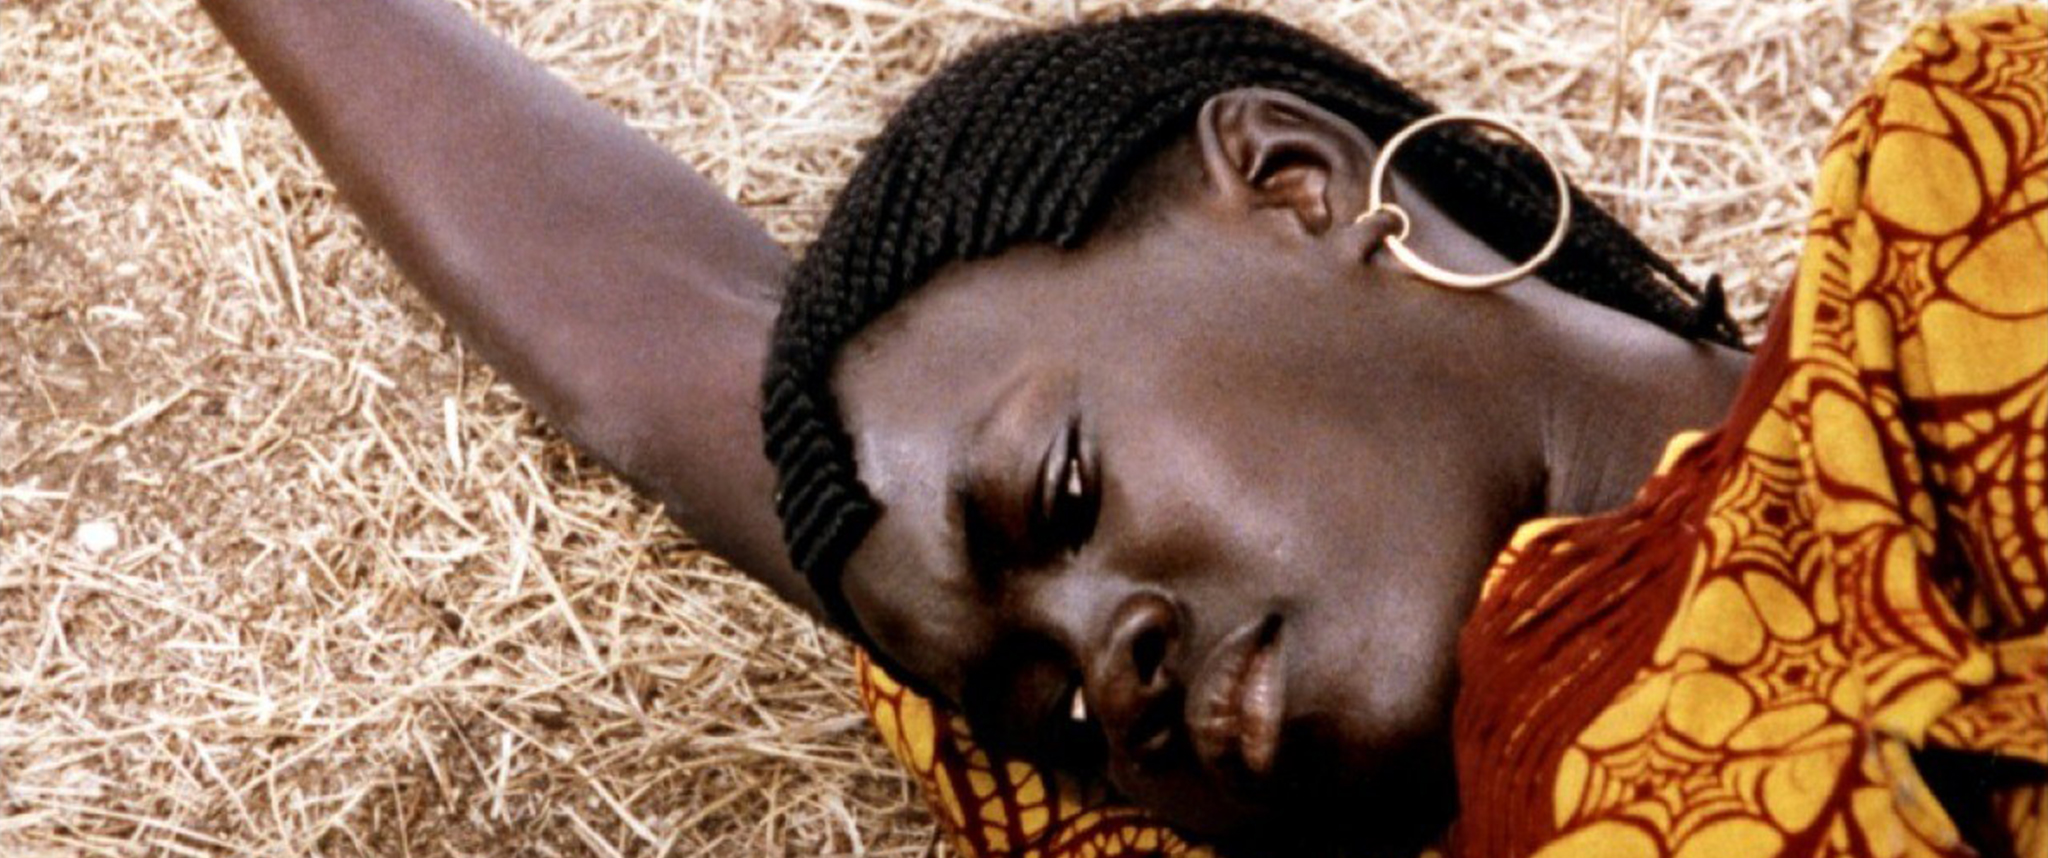 female filmmakers festival mossane safi faye copy.jpg